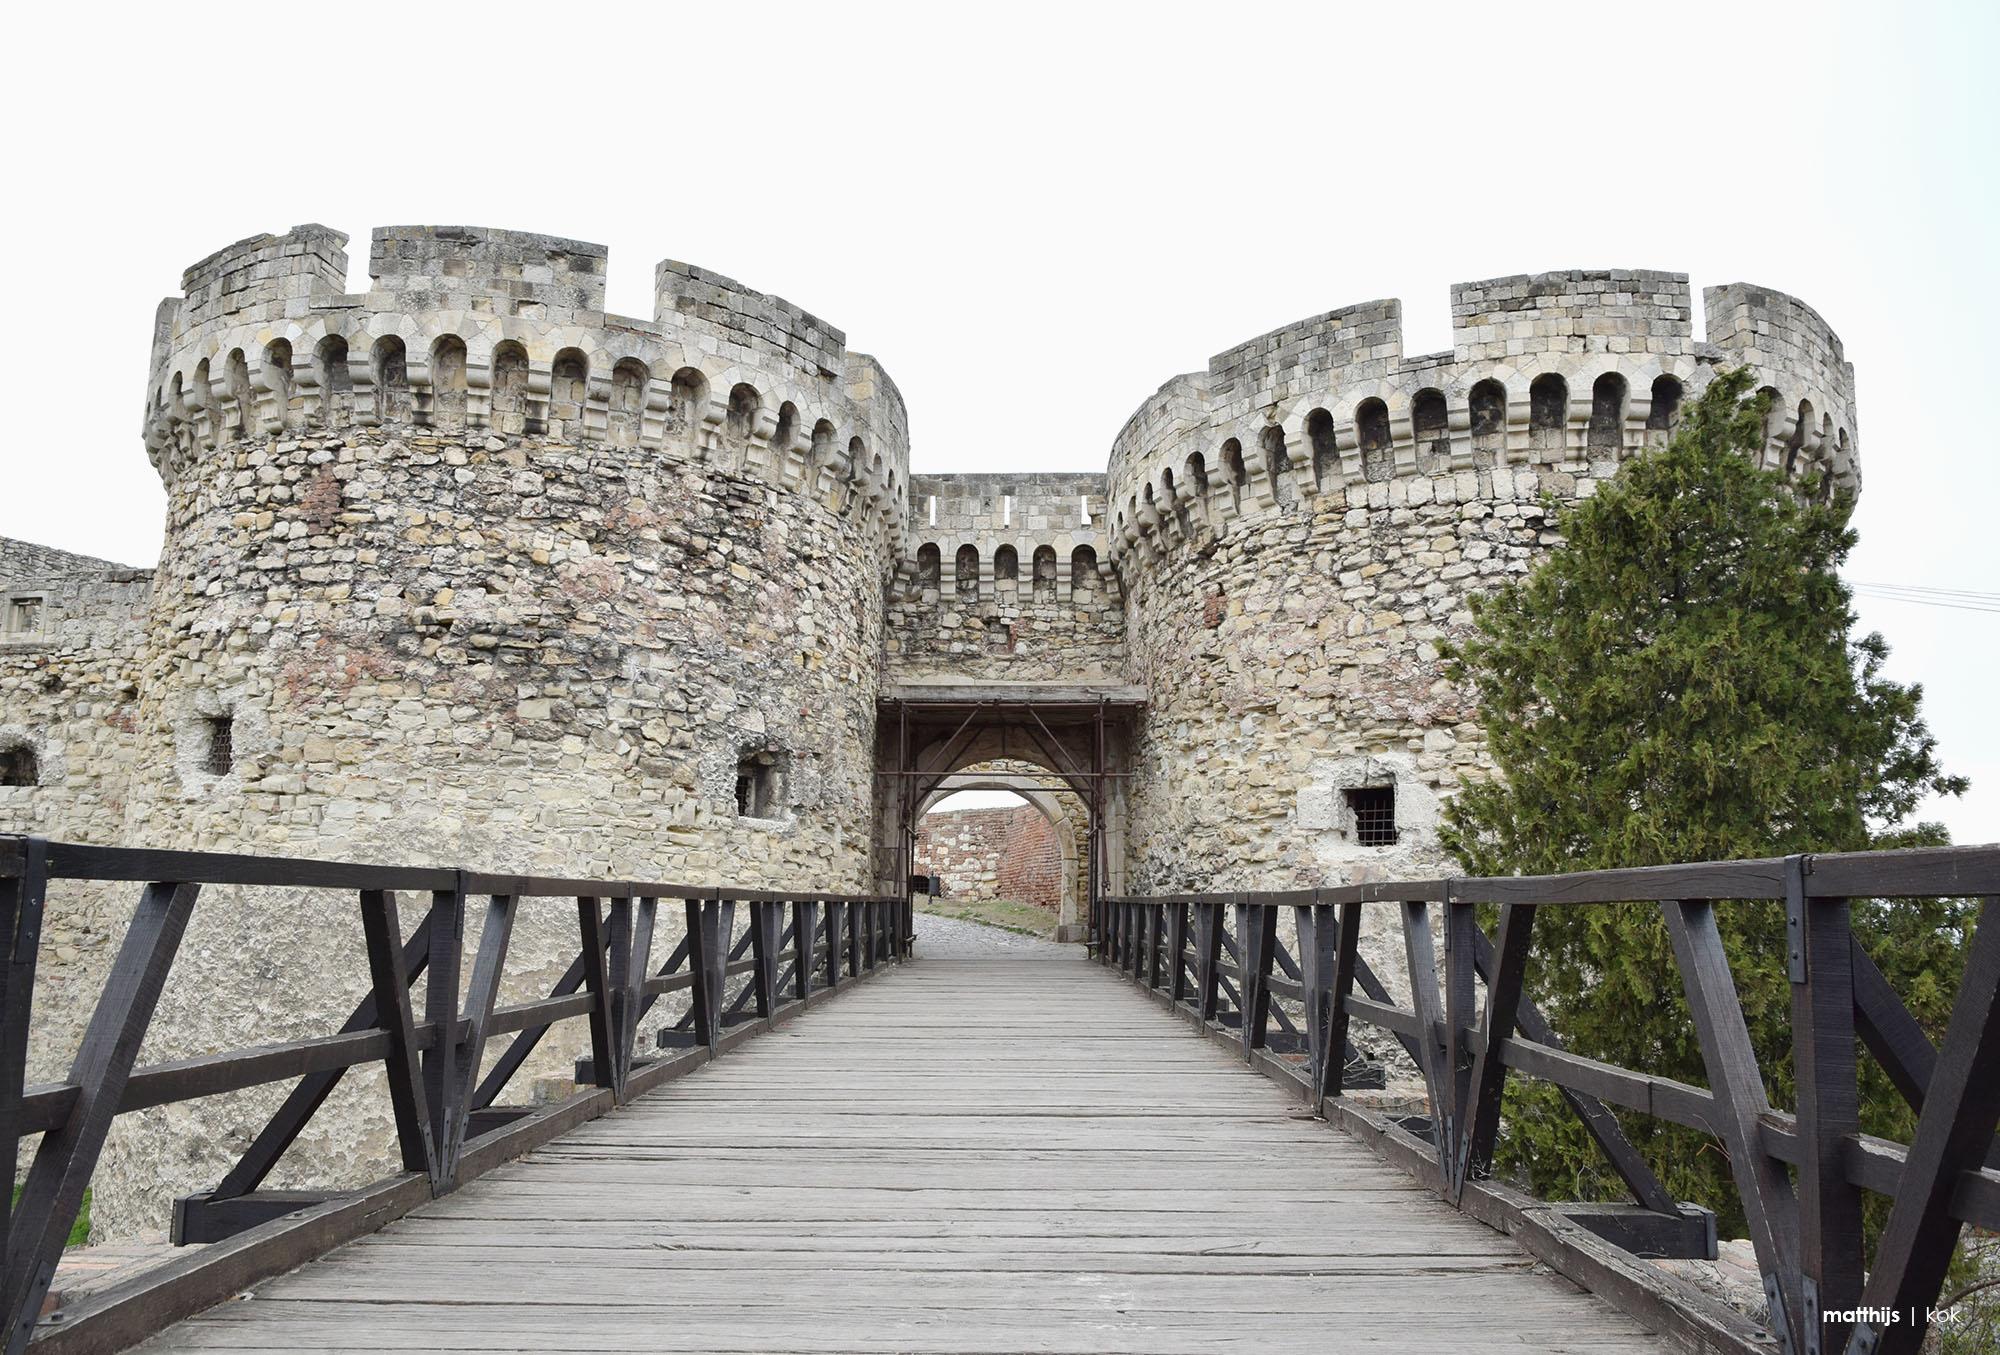 Kalemegdan Fortress, Belgrade, Serbia   Photo by Matthijs Kok